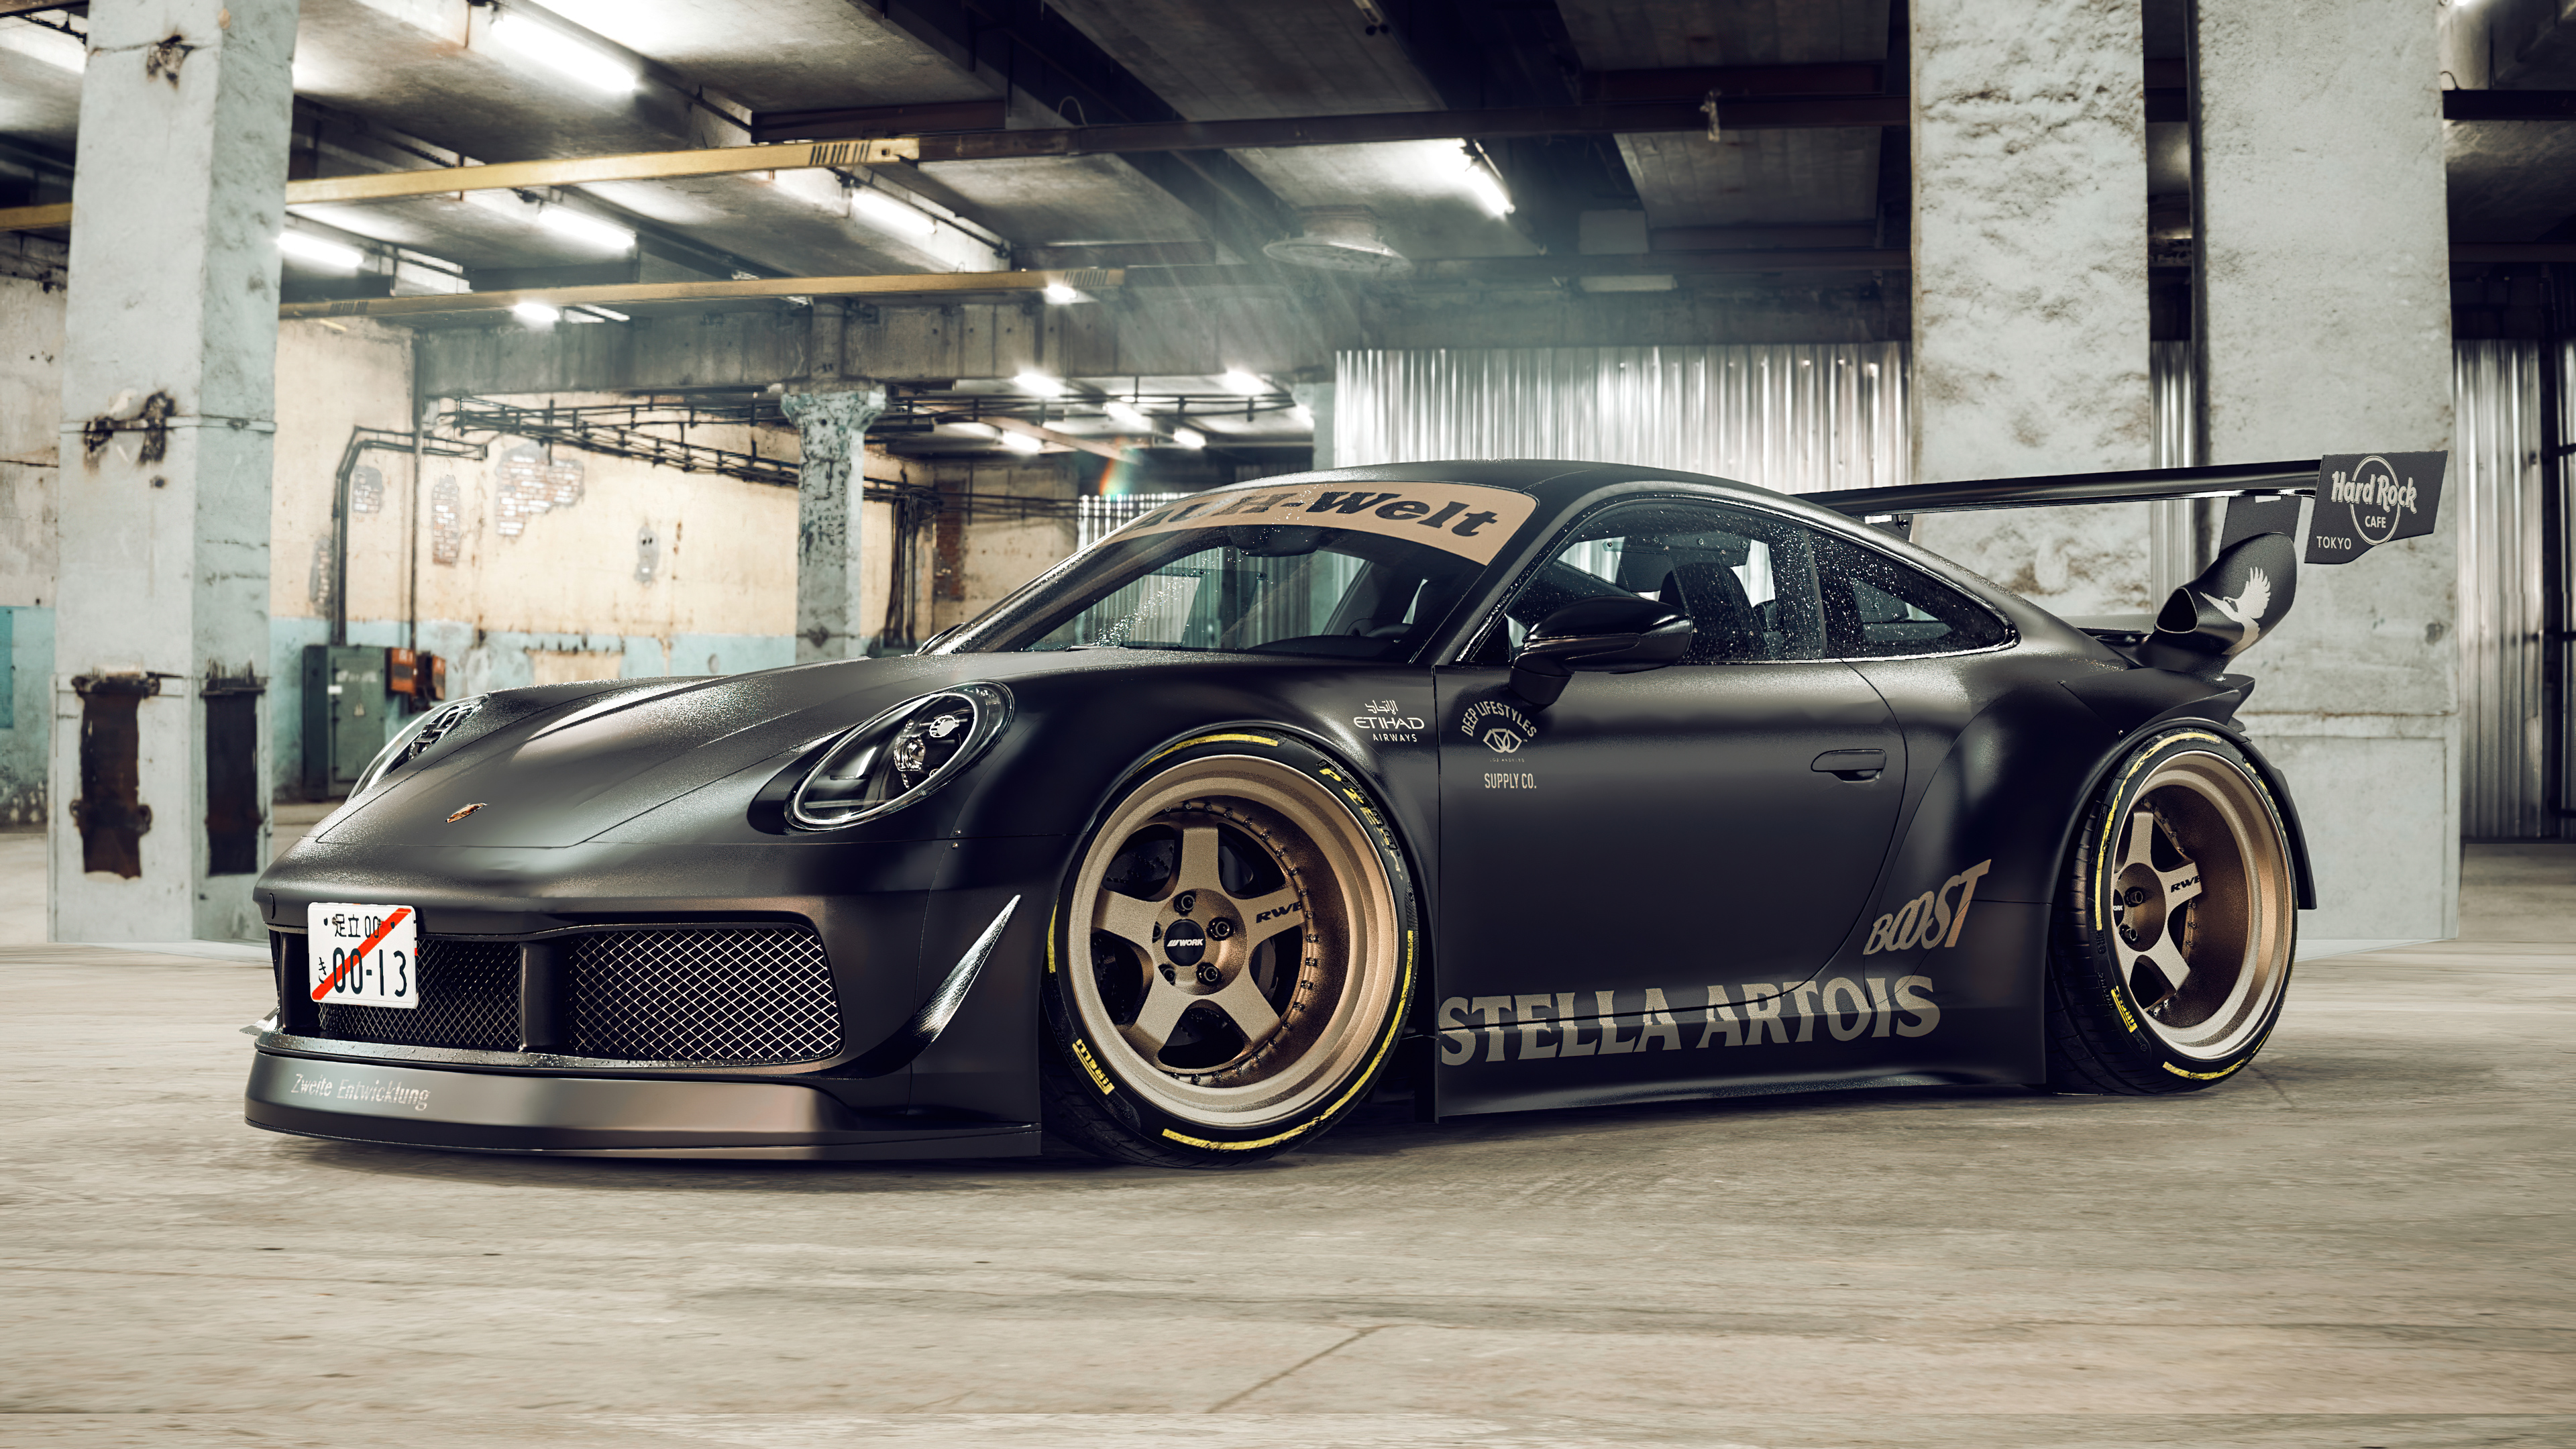 porsche golden rims 4k 1614626943 - Porsche Golden Rims 4k - Porsche Golden Rims 4k wallpapers